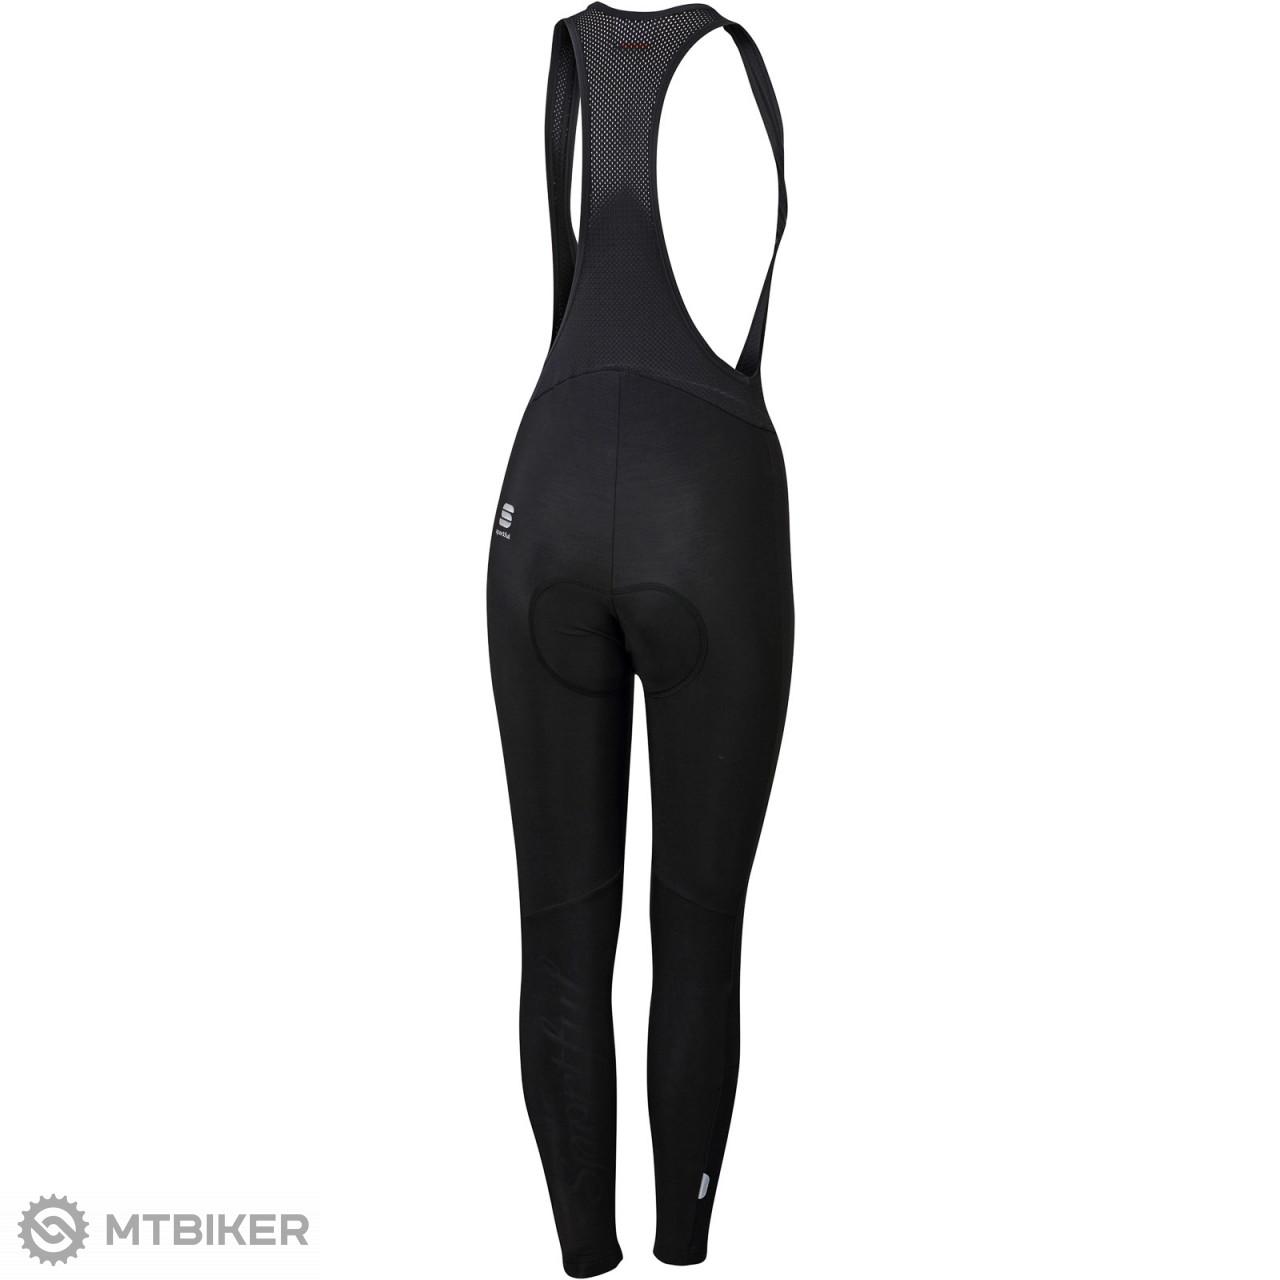 a24d006112933 Sportful Luna nohavice s trakmi dámske čierne - MTBIKER Shop